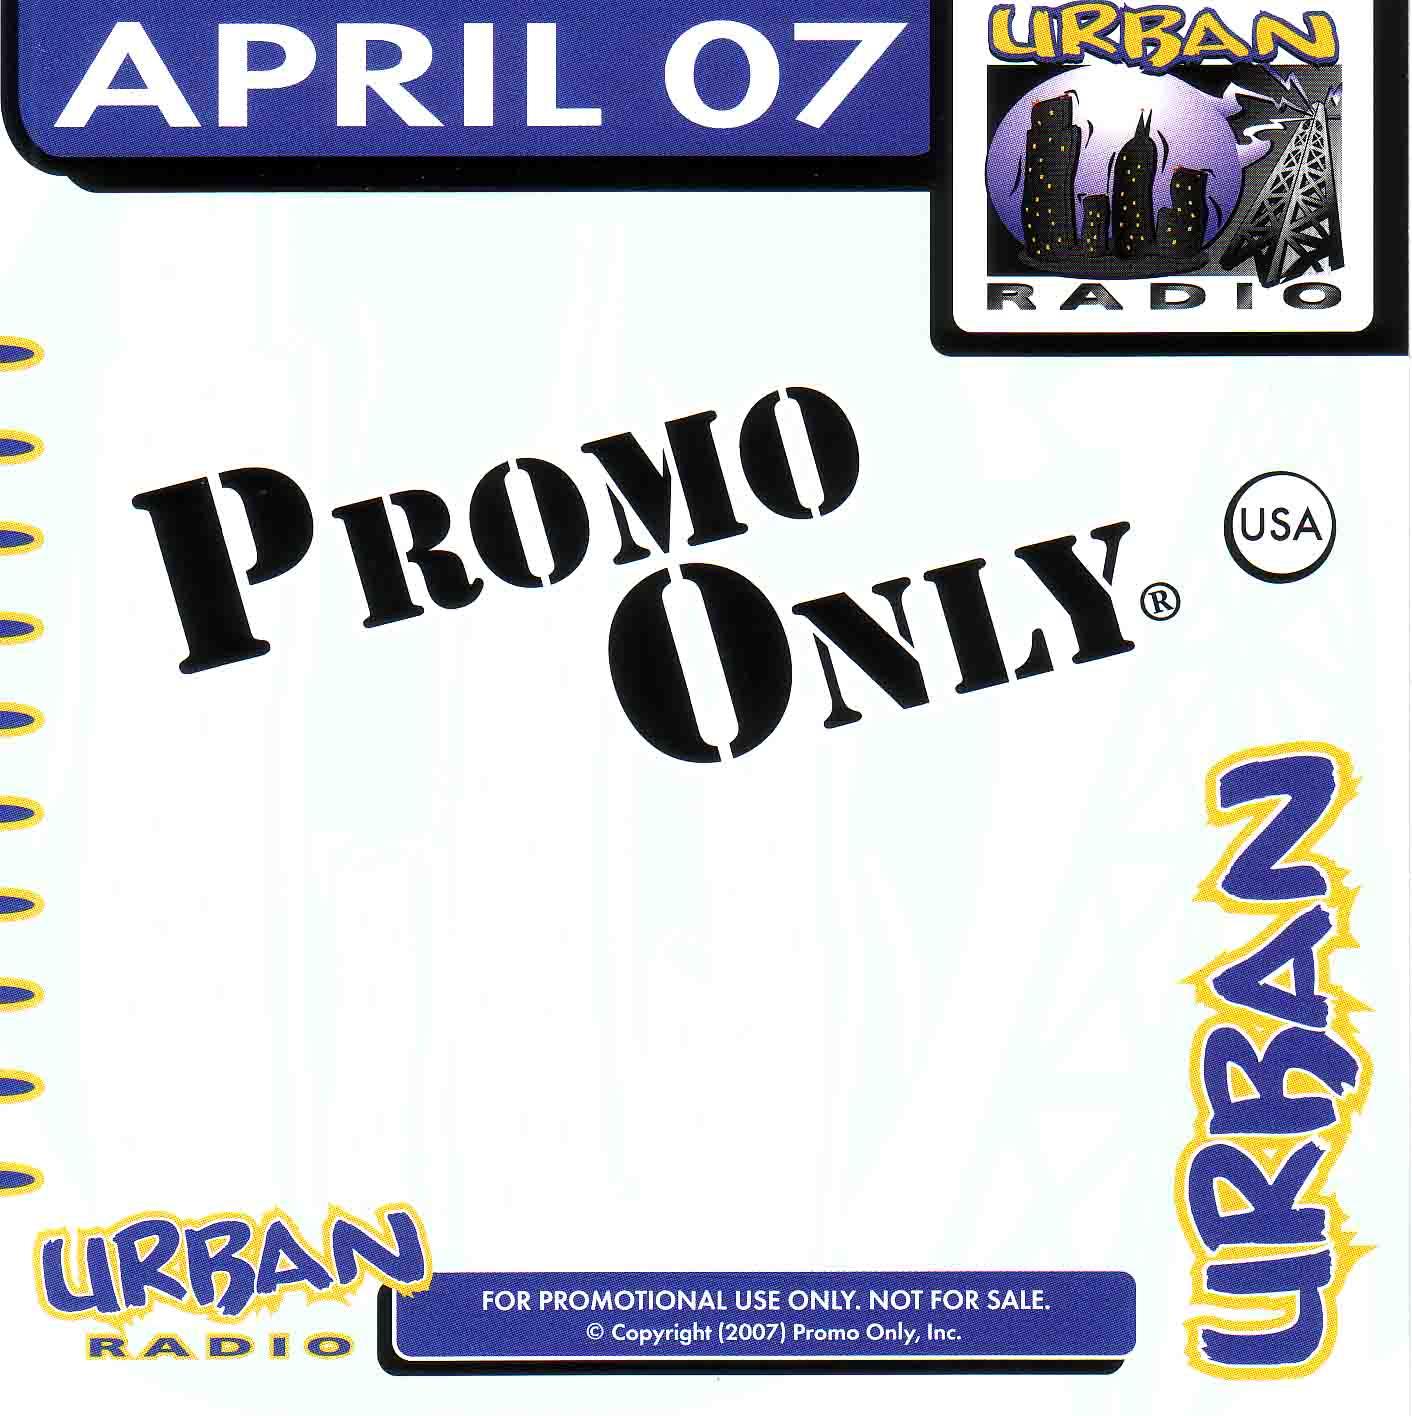 http://3.bp.blogspot.com/_9cw-jhhRBE4/S_6gznuoL2I/AAAAAAAADZo/QNFxjdzHRds/s1600/00-va-promo_only_urban_radio_april-2007-front.jpg